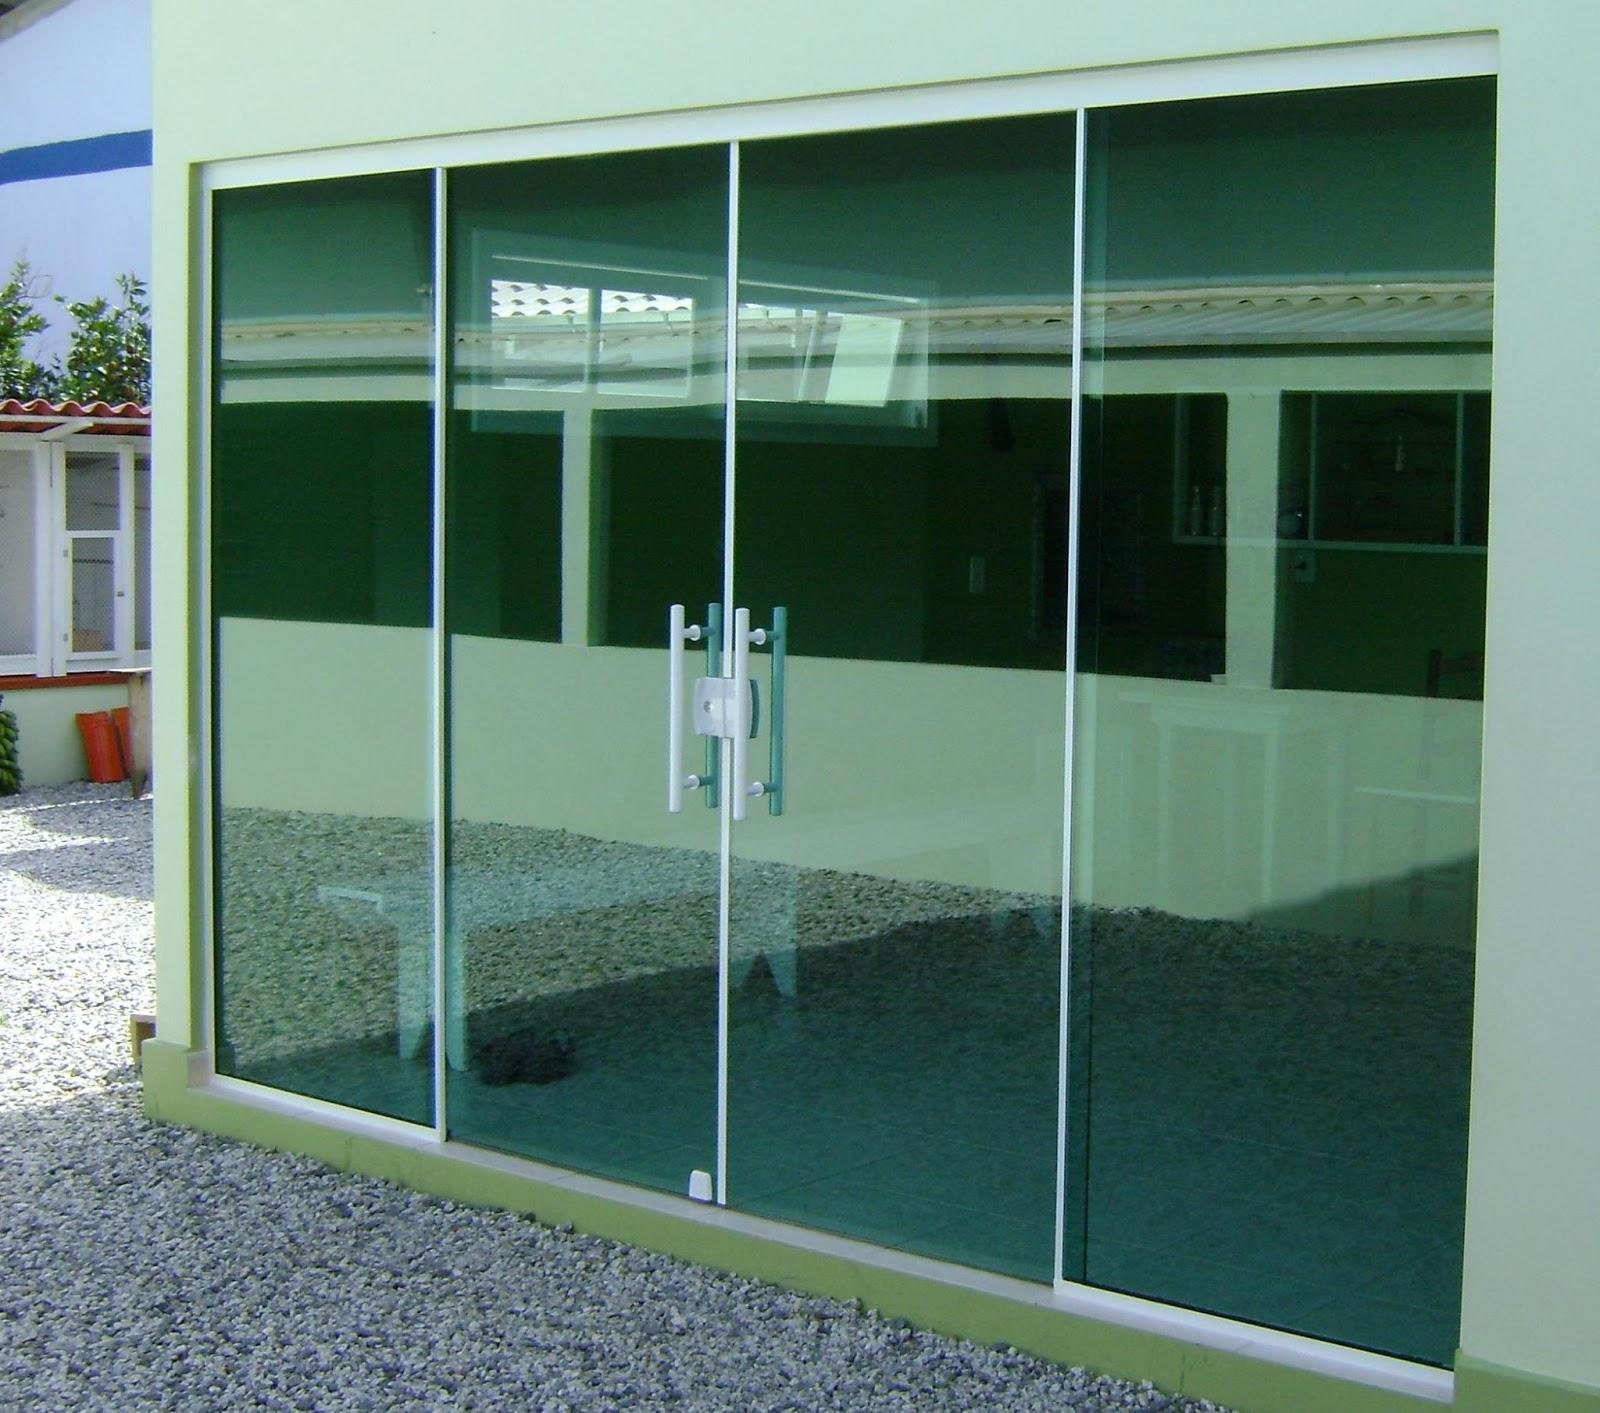 #163628 Construindo Minha Casa Clean: Película Residencial 1594 Vidros Ou Janelas Eletrocrômicos